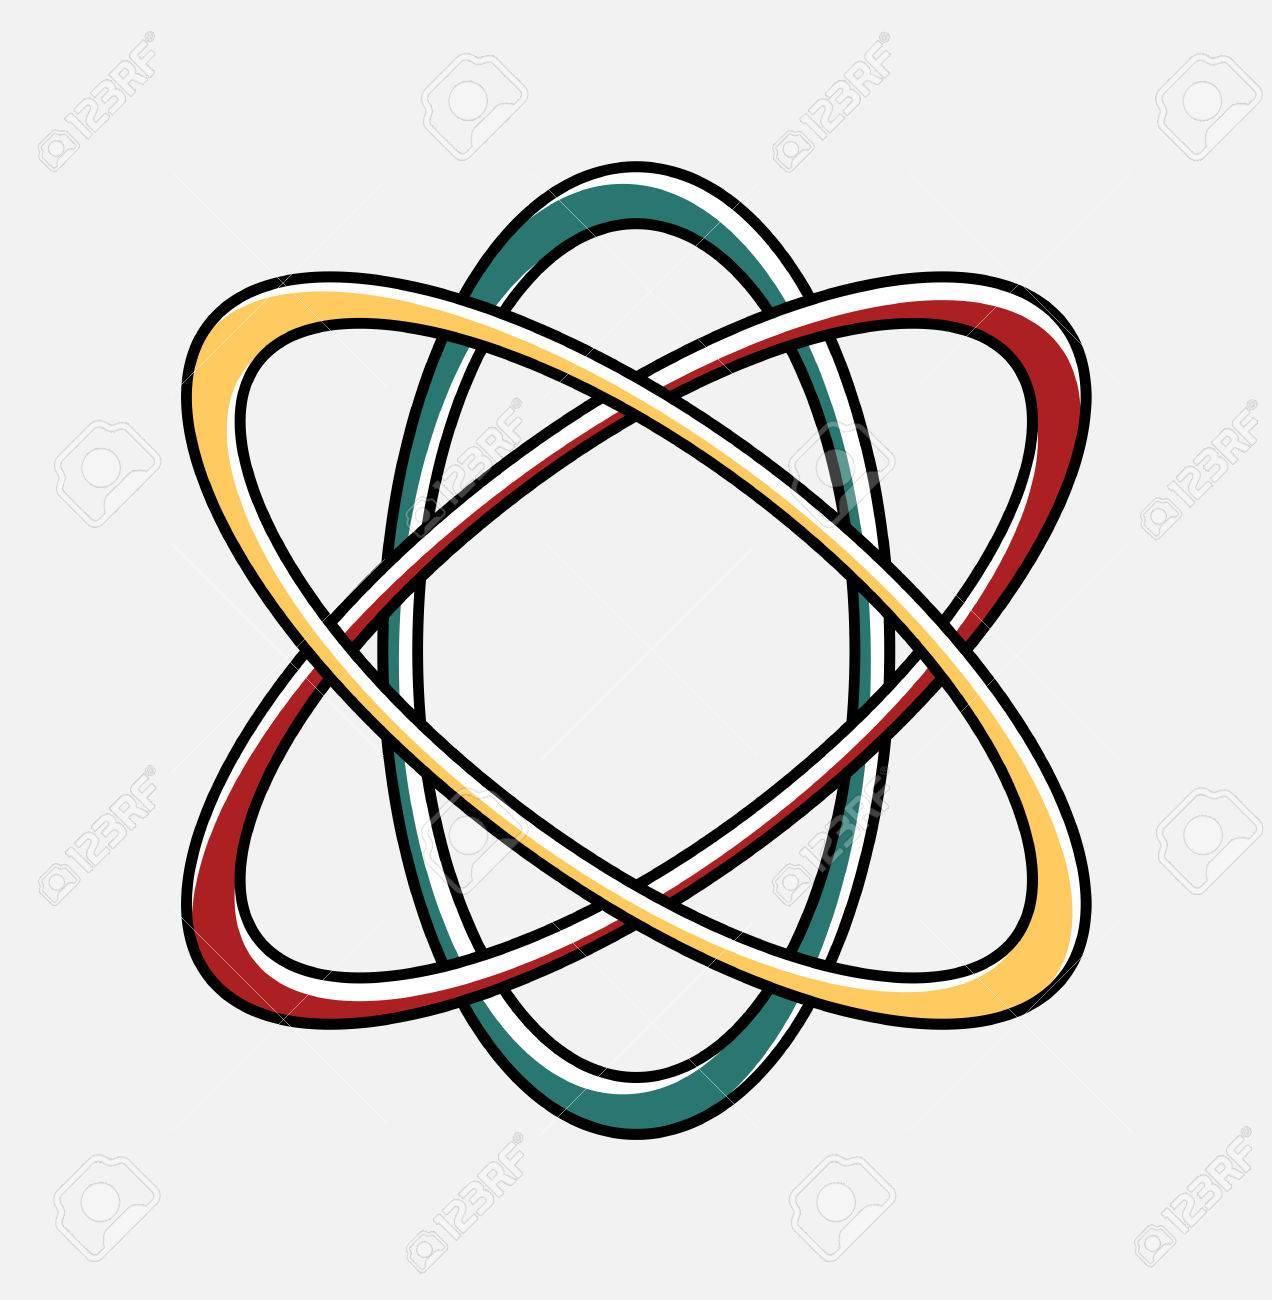 Atheism symbol design royalty free cliparts vectors and stock atheism symbol design stock vector 57729733 biocorpaavc Choice Image